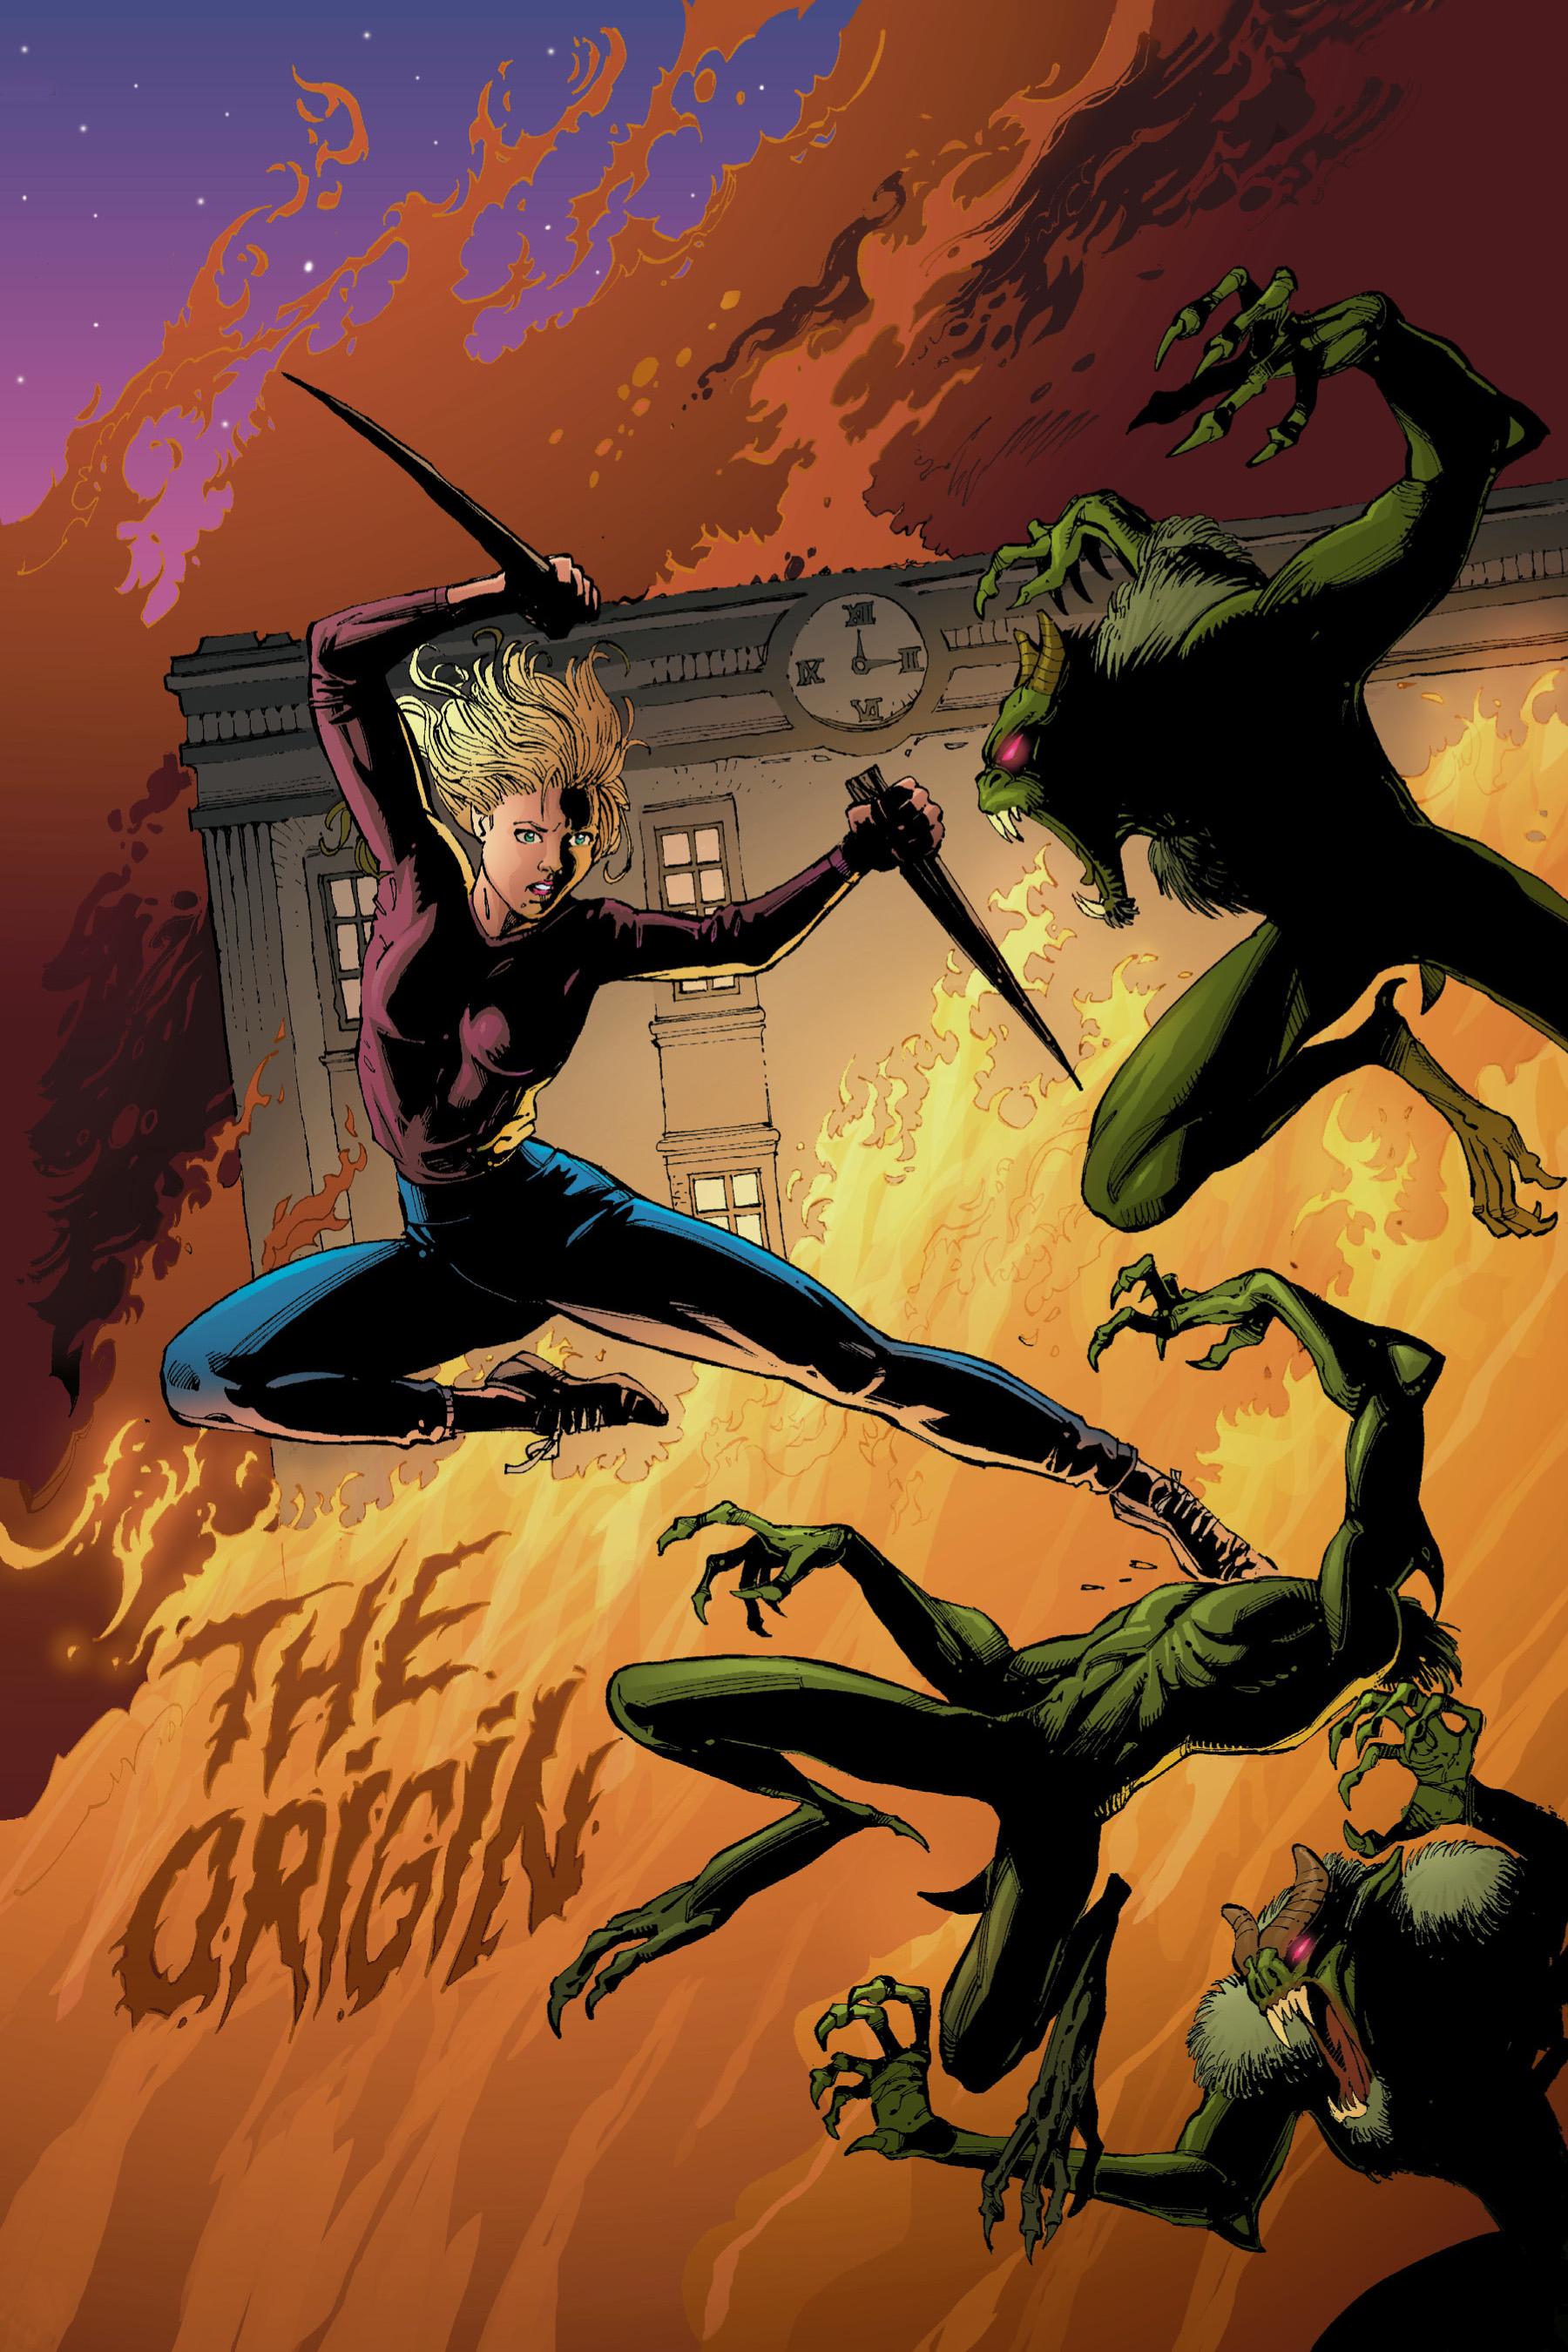 Read online Buffy the Vampire Slayer: Omnibus comic -  Issue # TPB 1 - 37